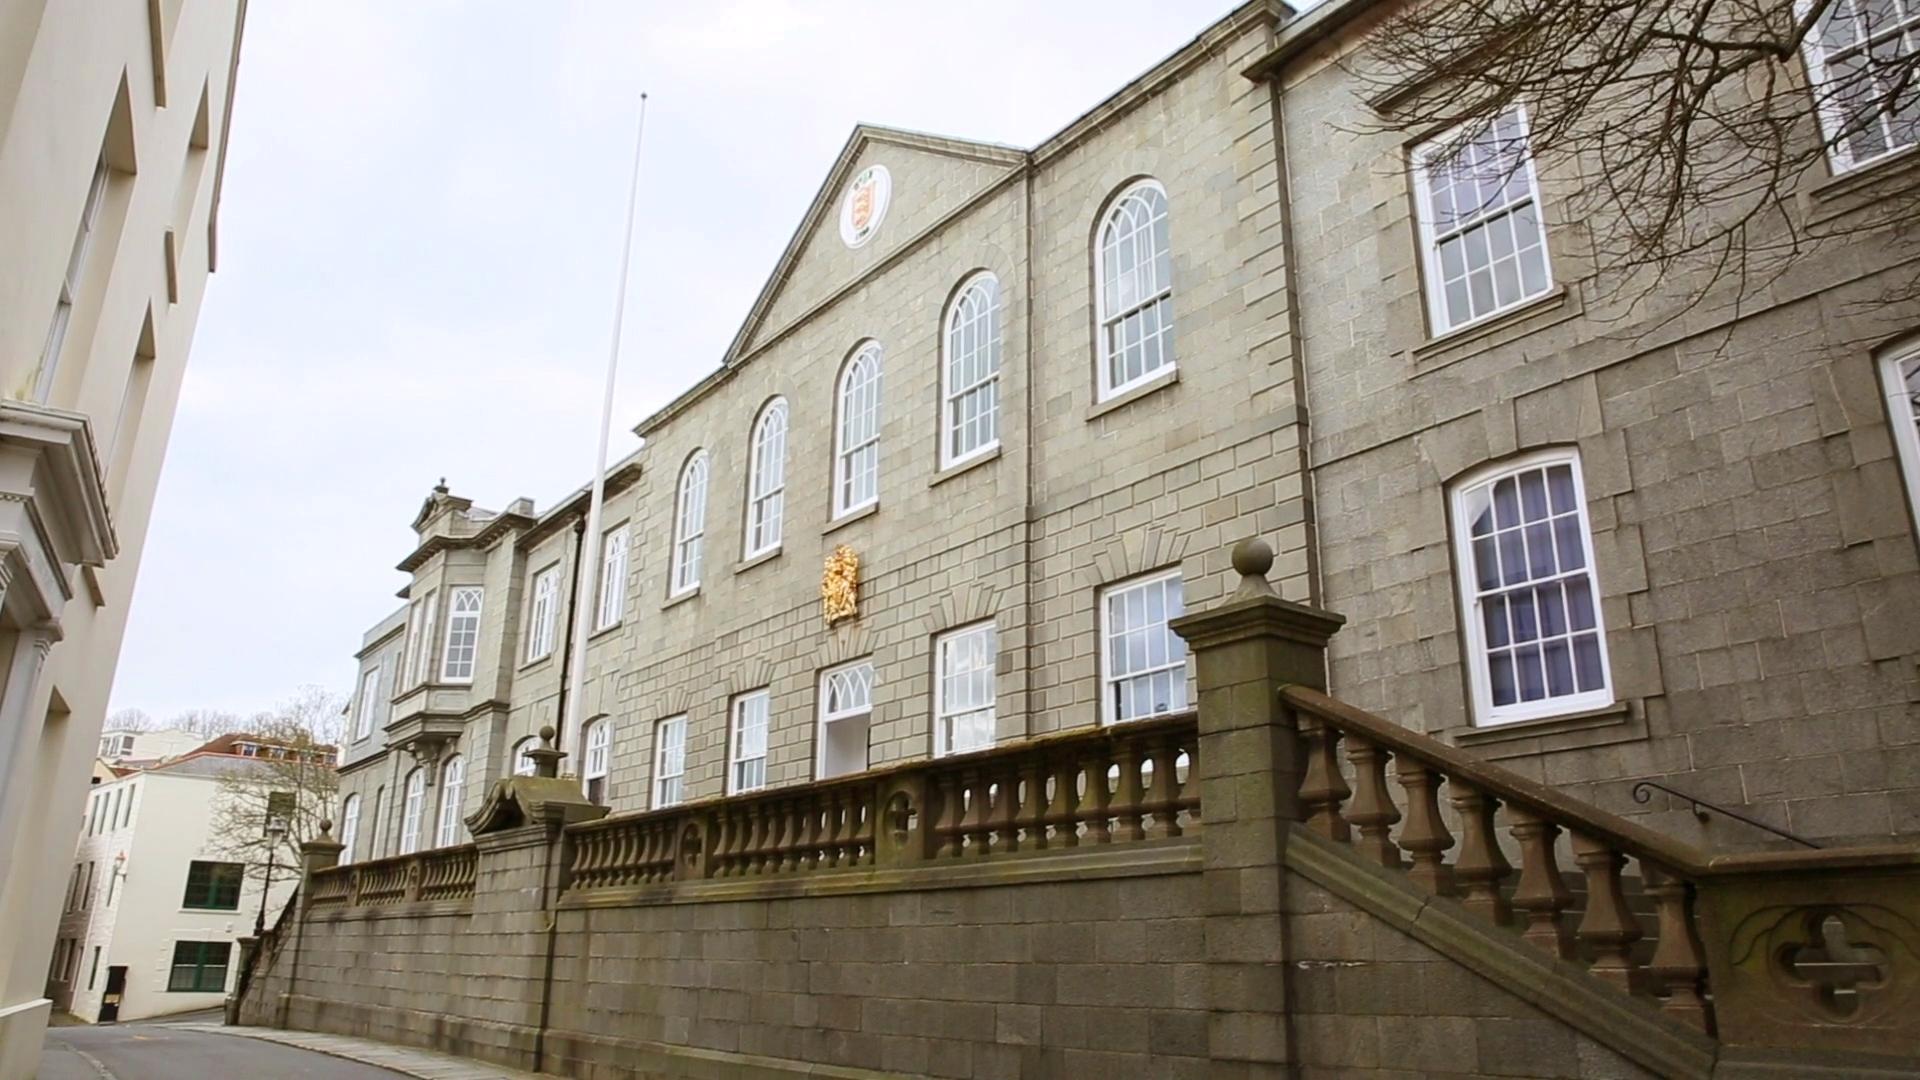 Greffe, Guernsey Royal Court